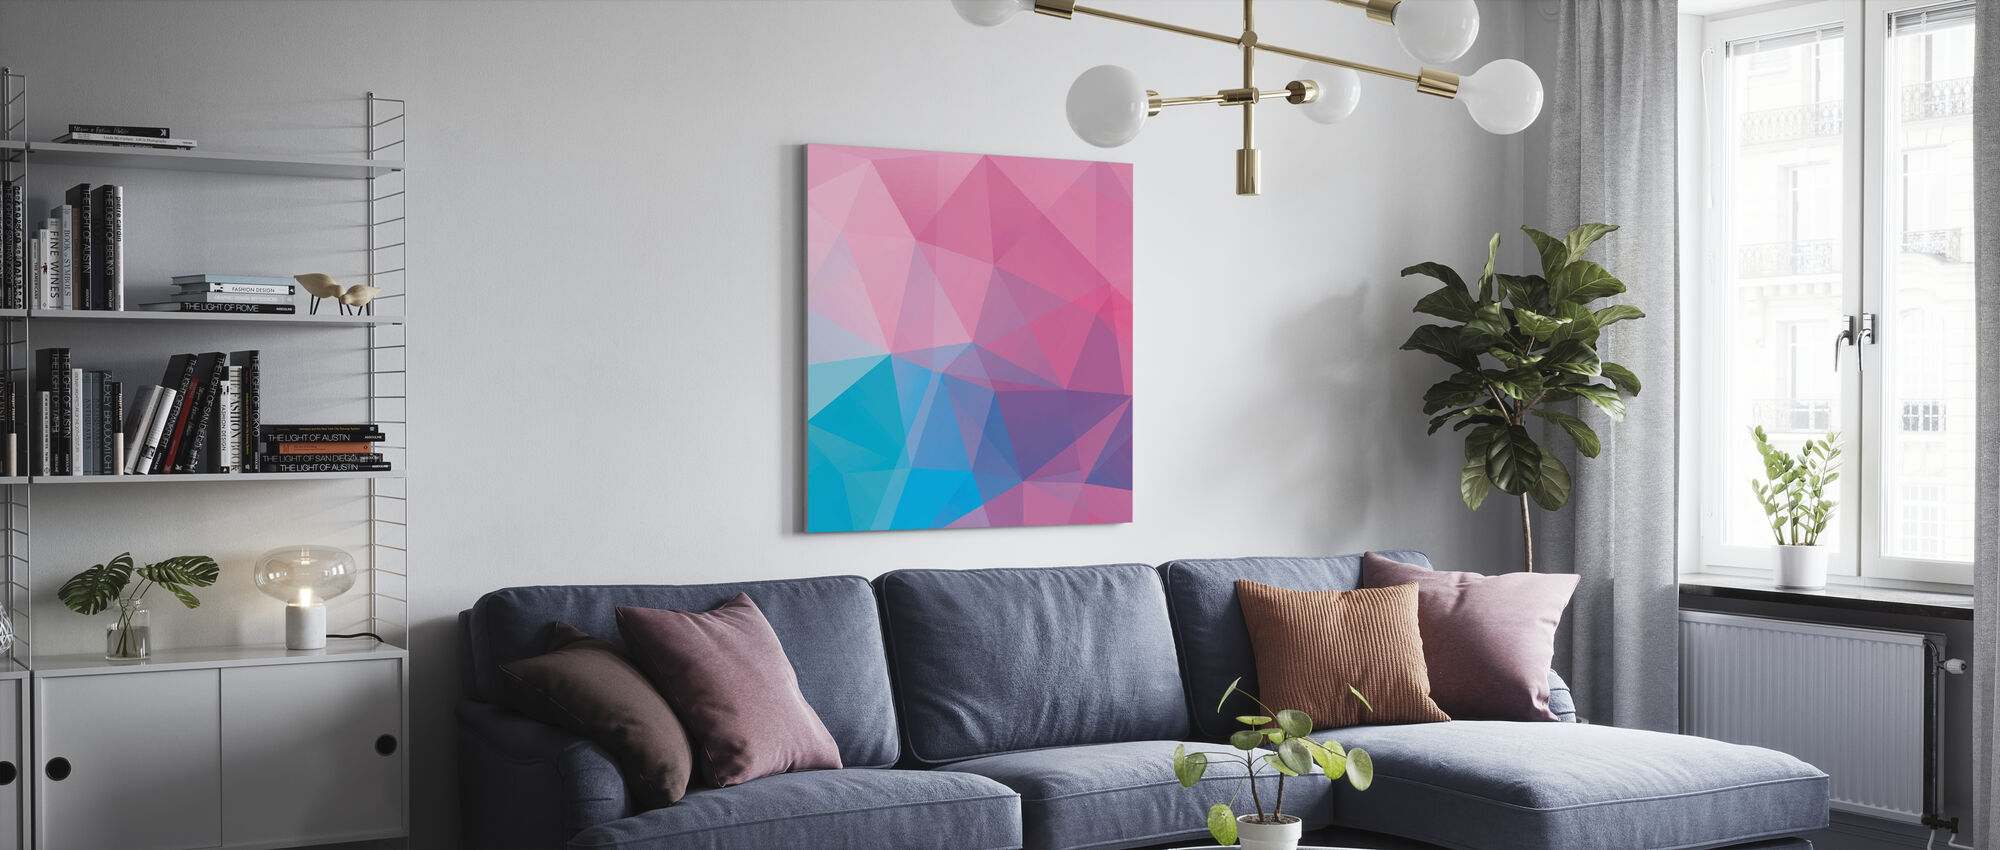 Polygonal Pastels - Canvas print - Living Room